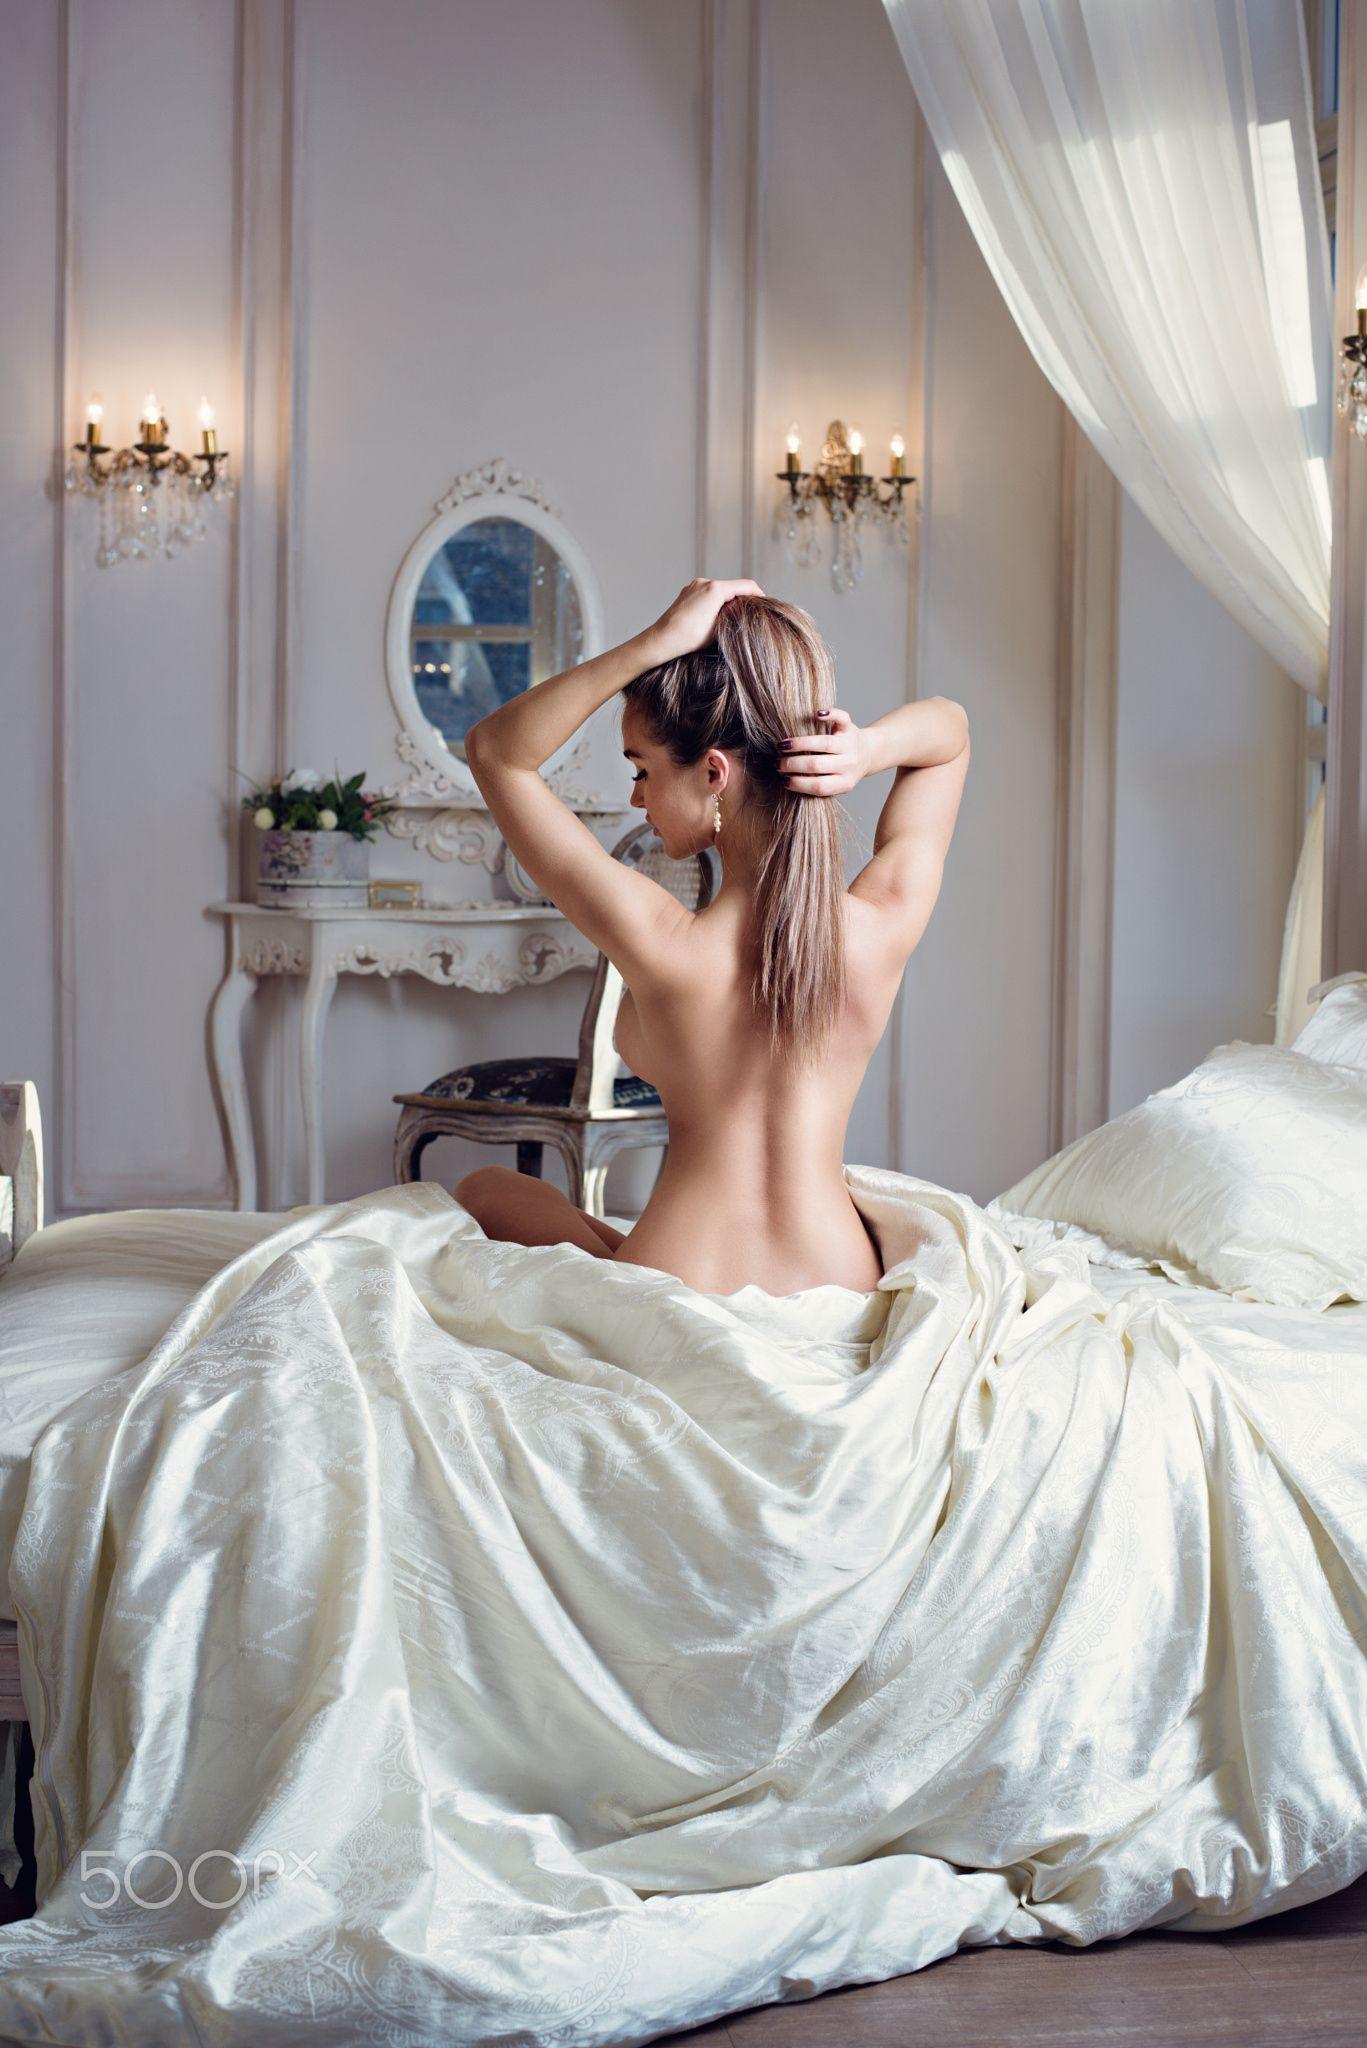 nude naked pose girl lady